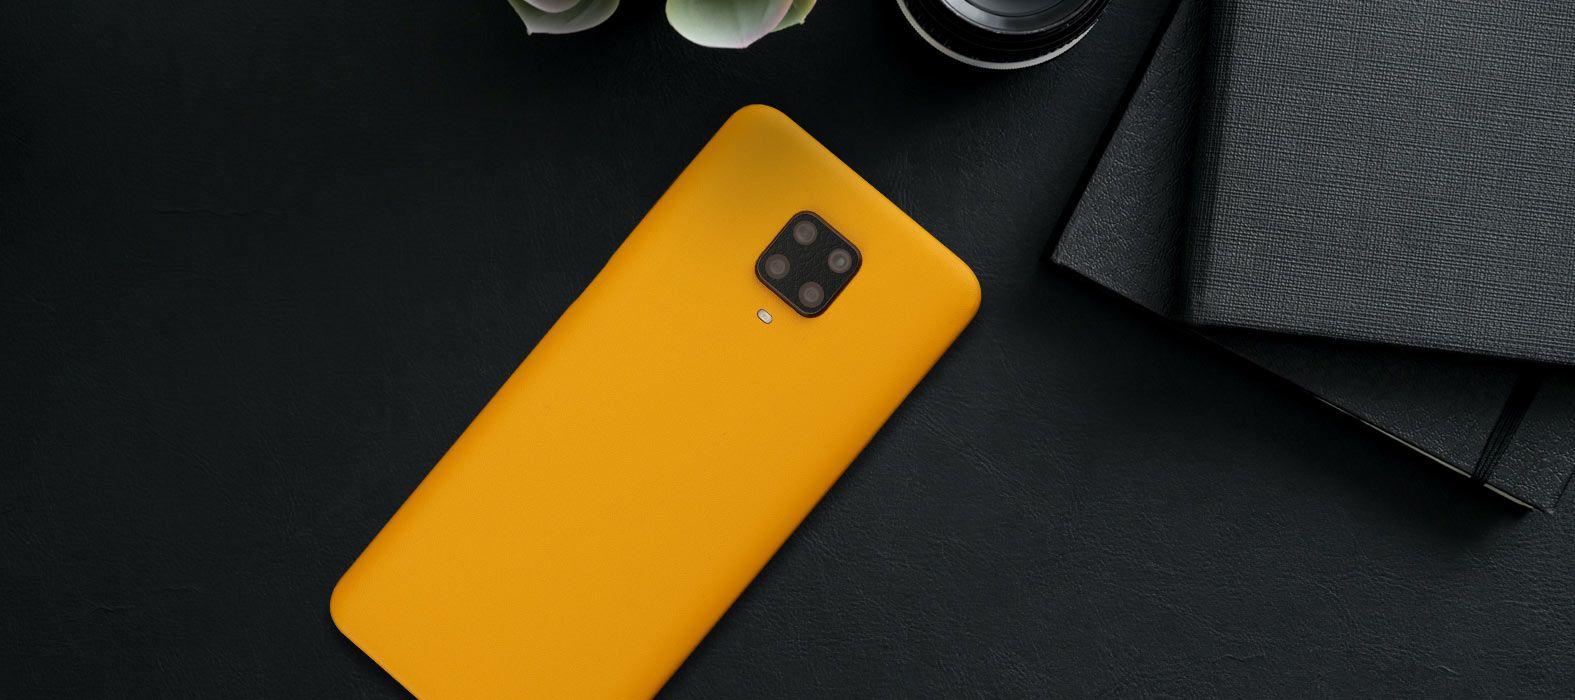 Poco M2 Pro Skins Wraps Covers Gadgetshieldz